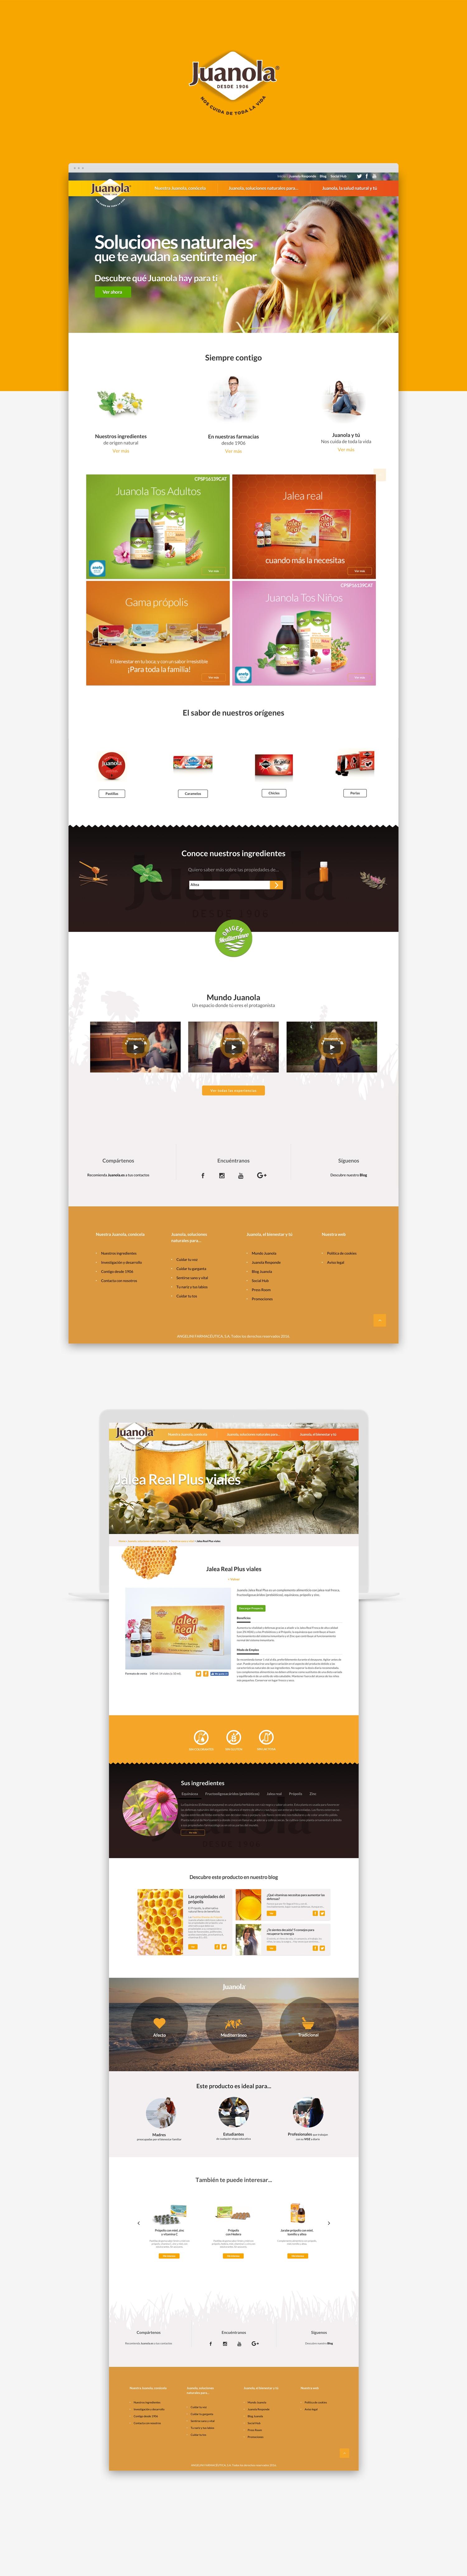 Diseñador web responsive · Juanola · Samuel Matito · diseñador freelance